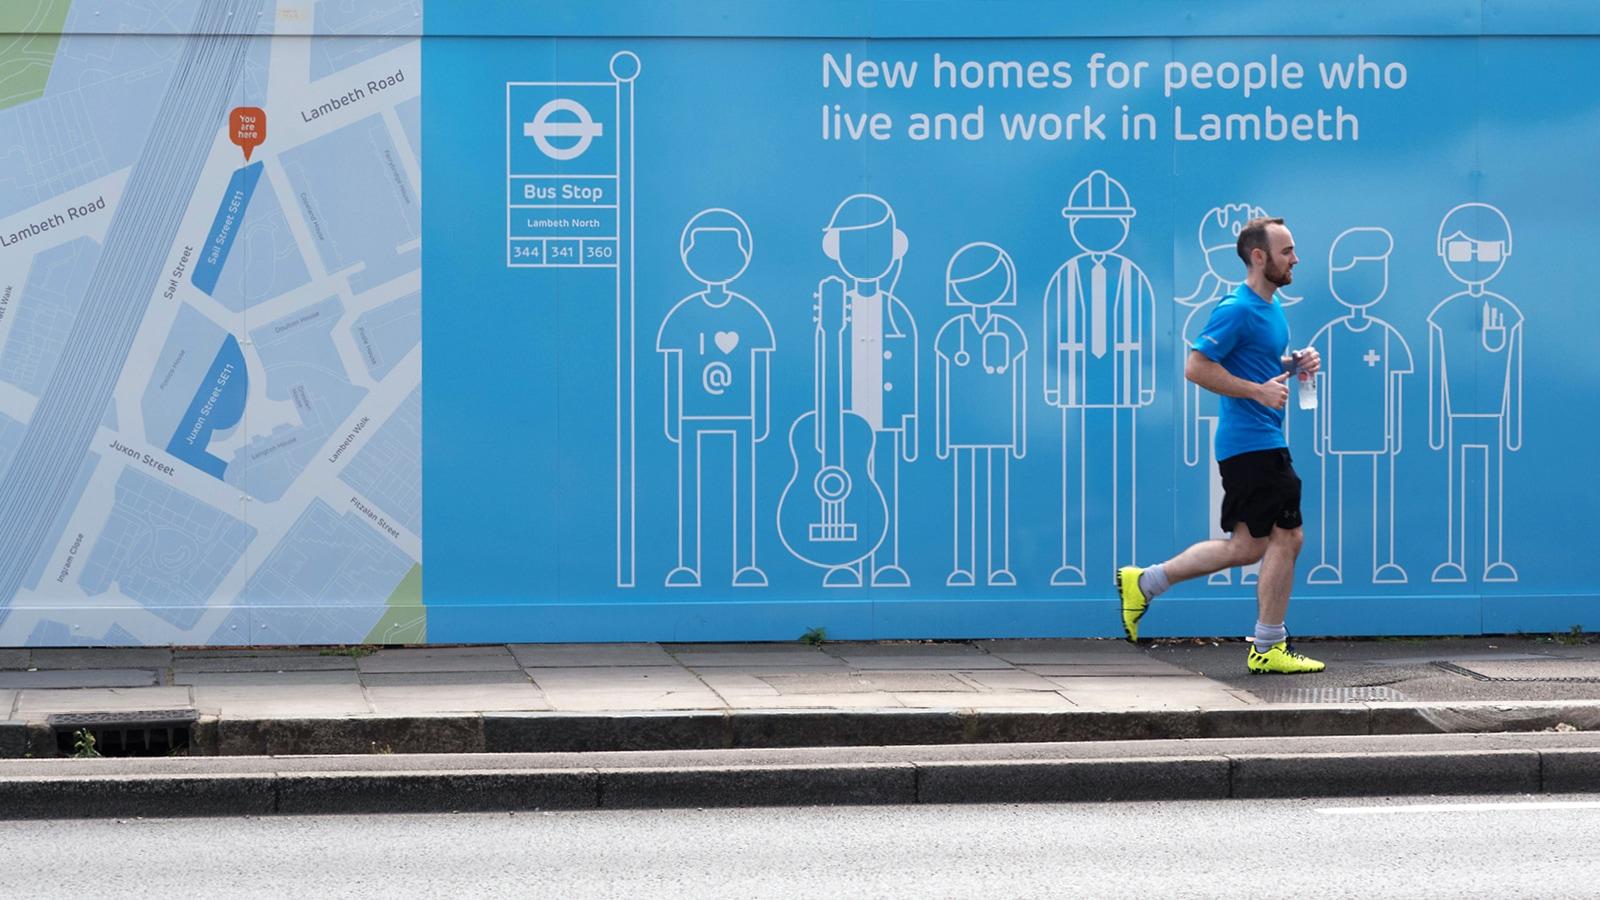 property-marketing-business-communications-branding-graphic-design-milton-keynes-london-hoarding